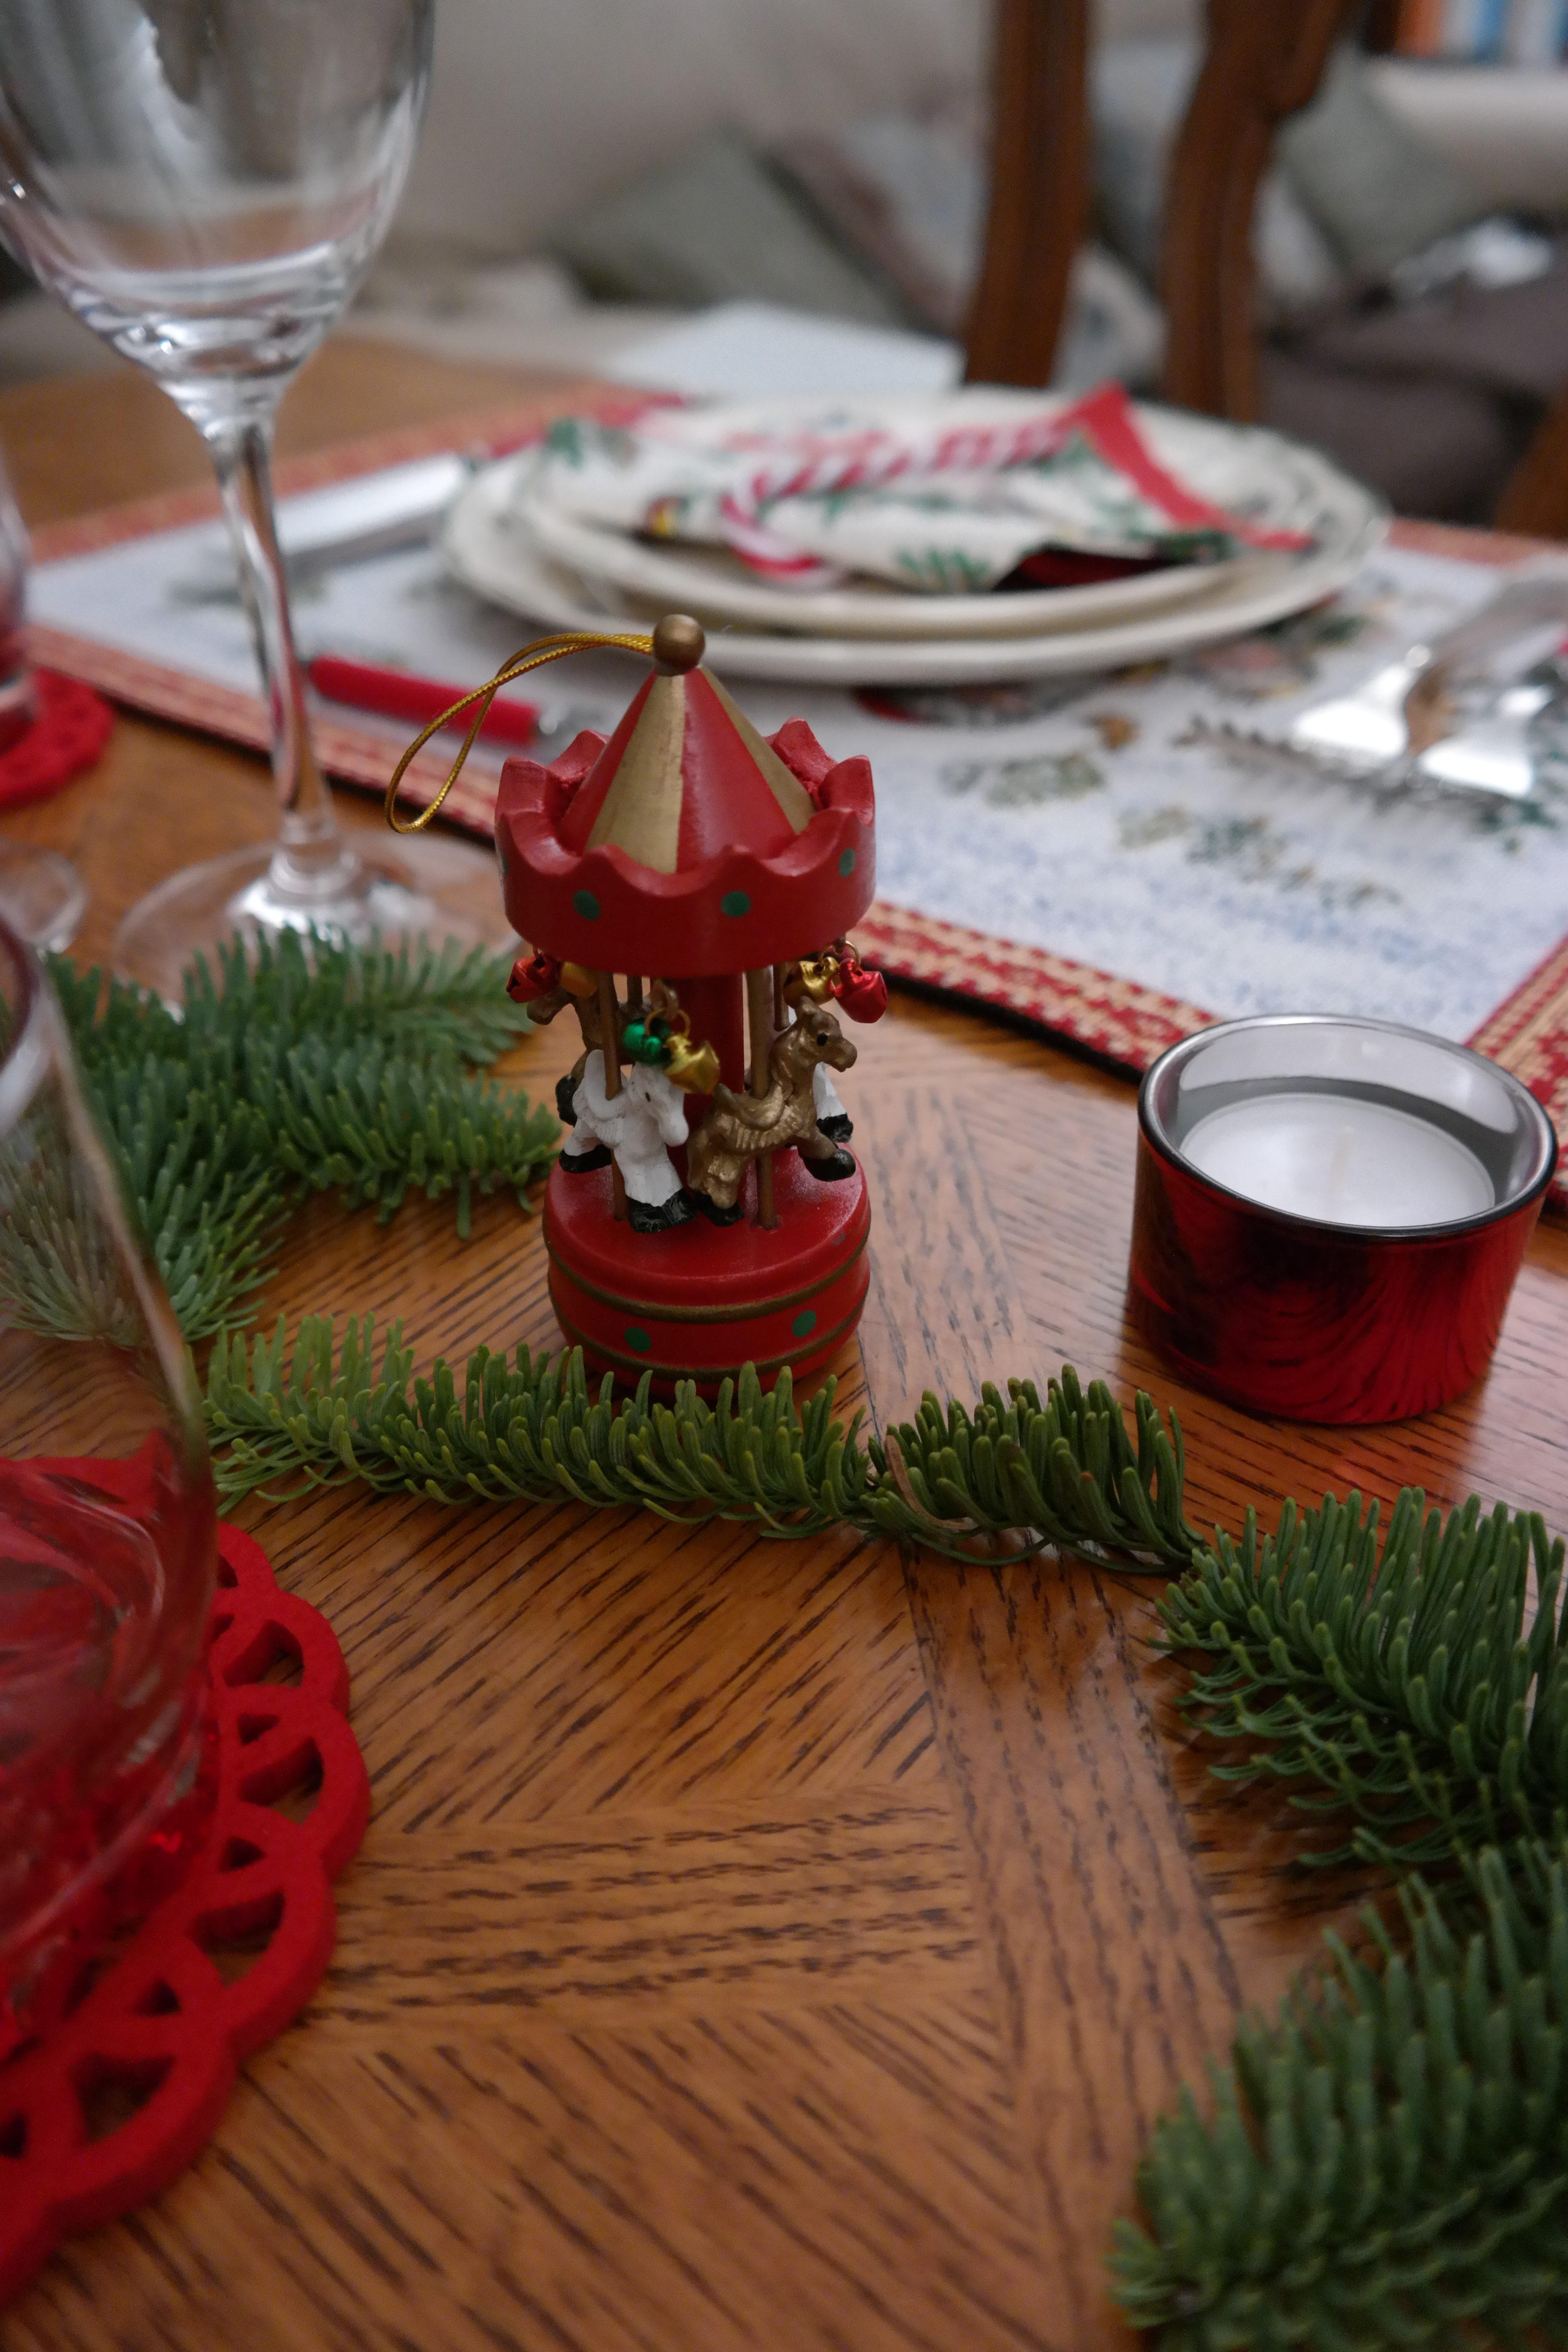 Noël et tradition - Carousel